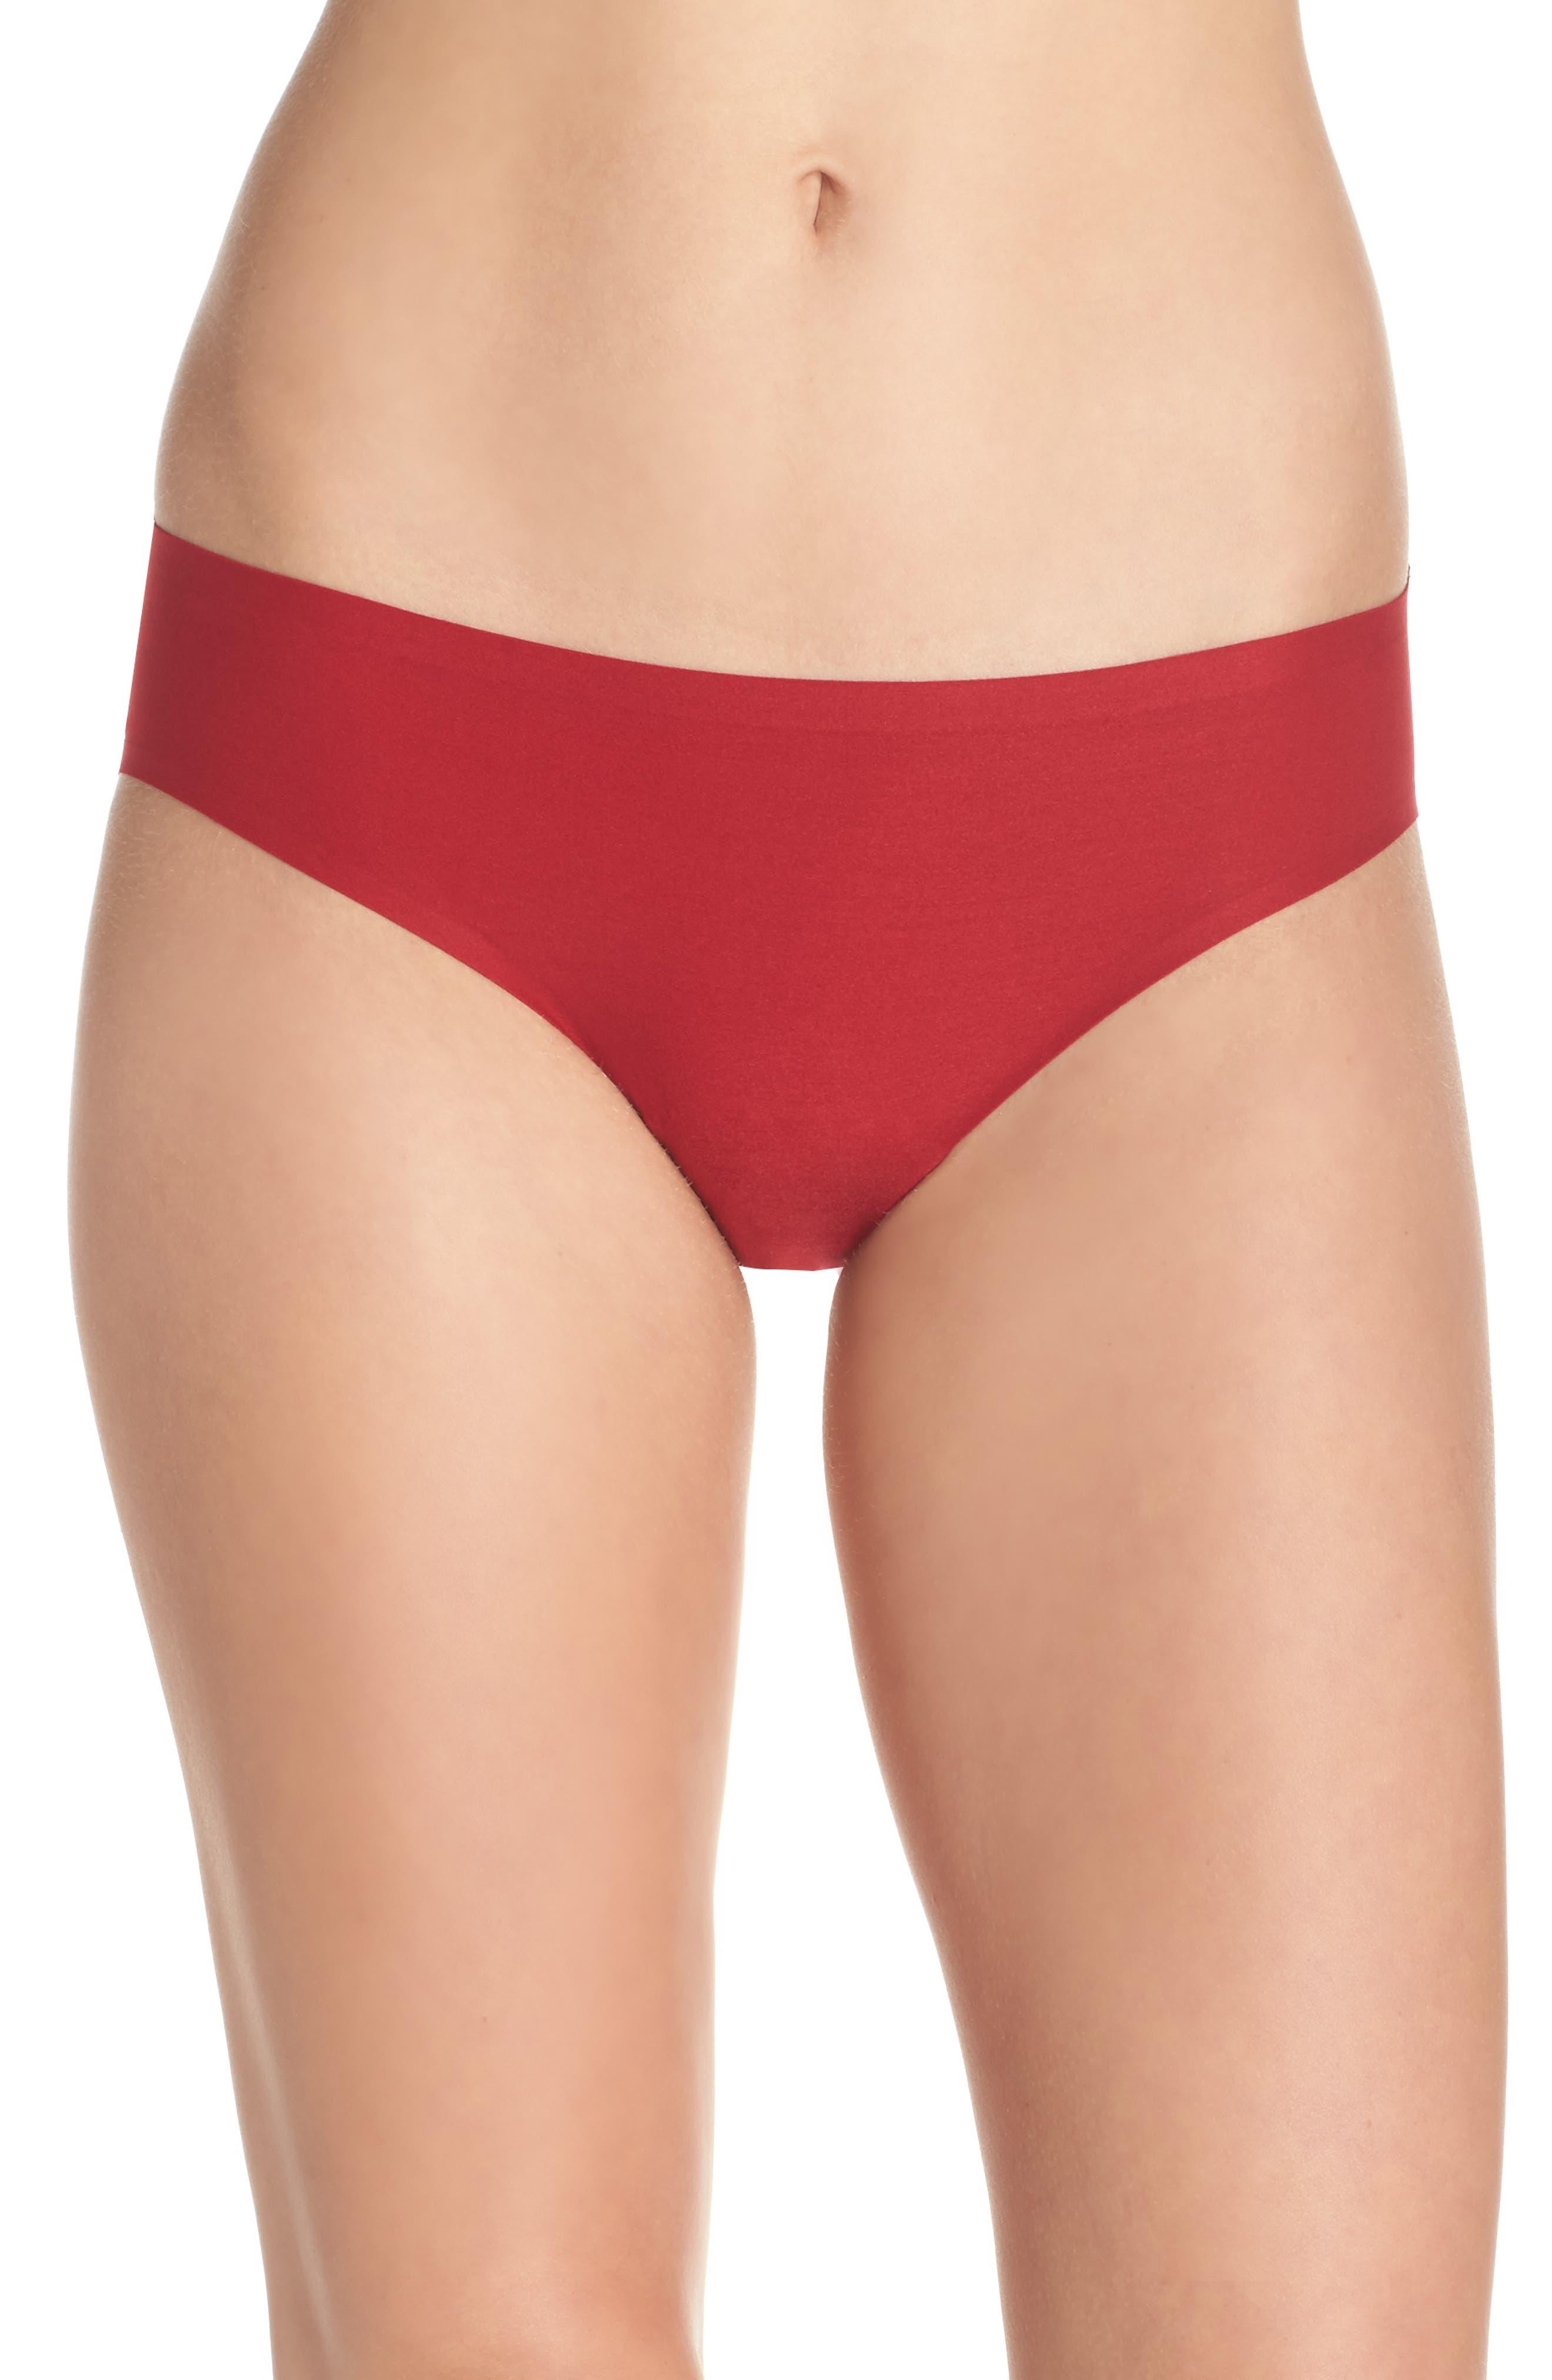 CHANTELLE INTIMATES Seamless Bikini